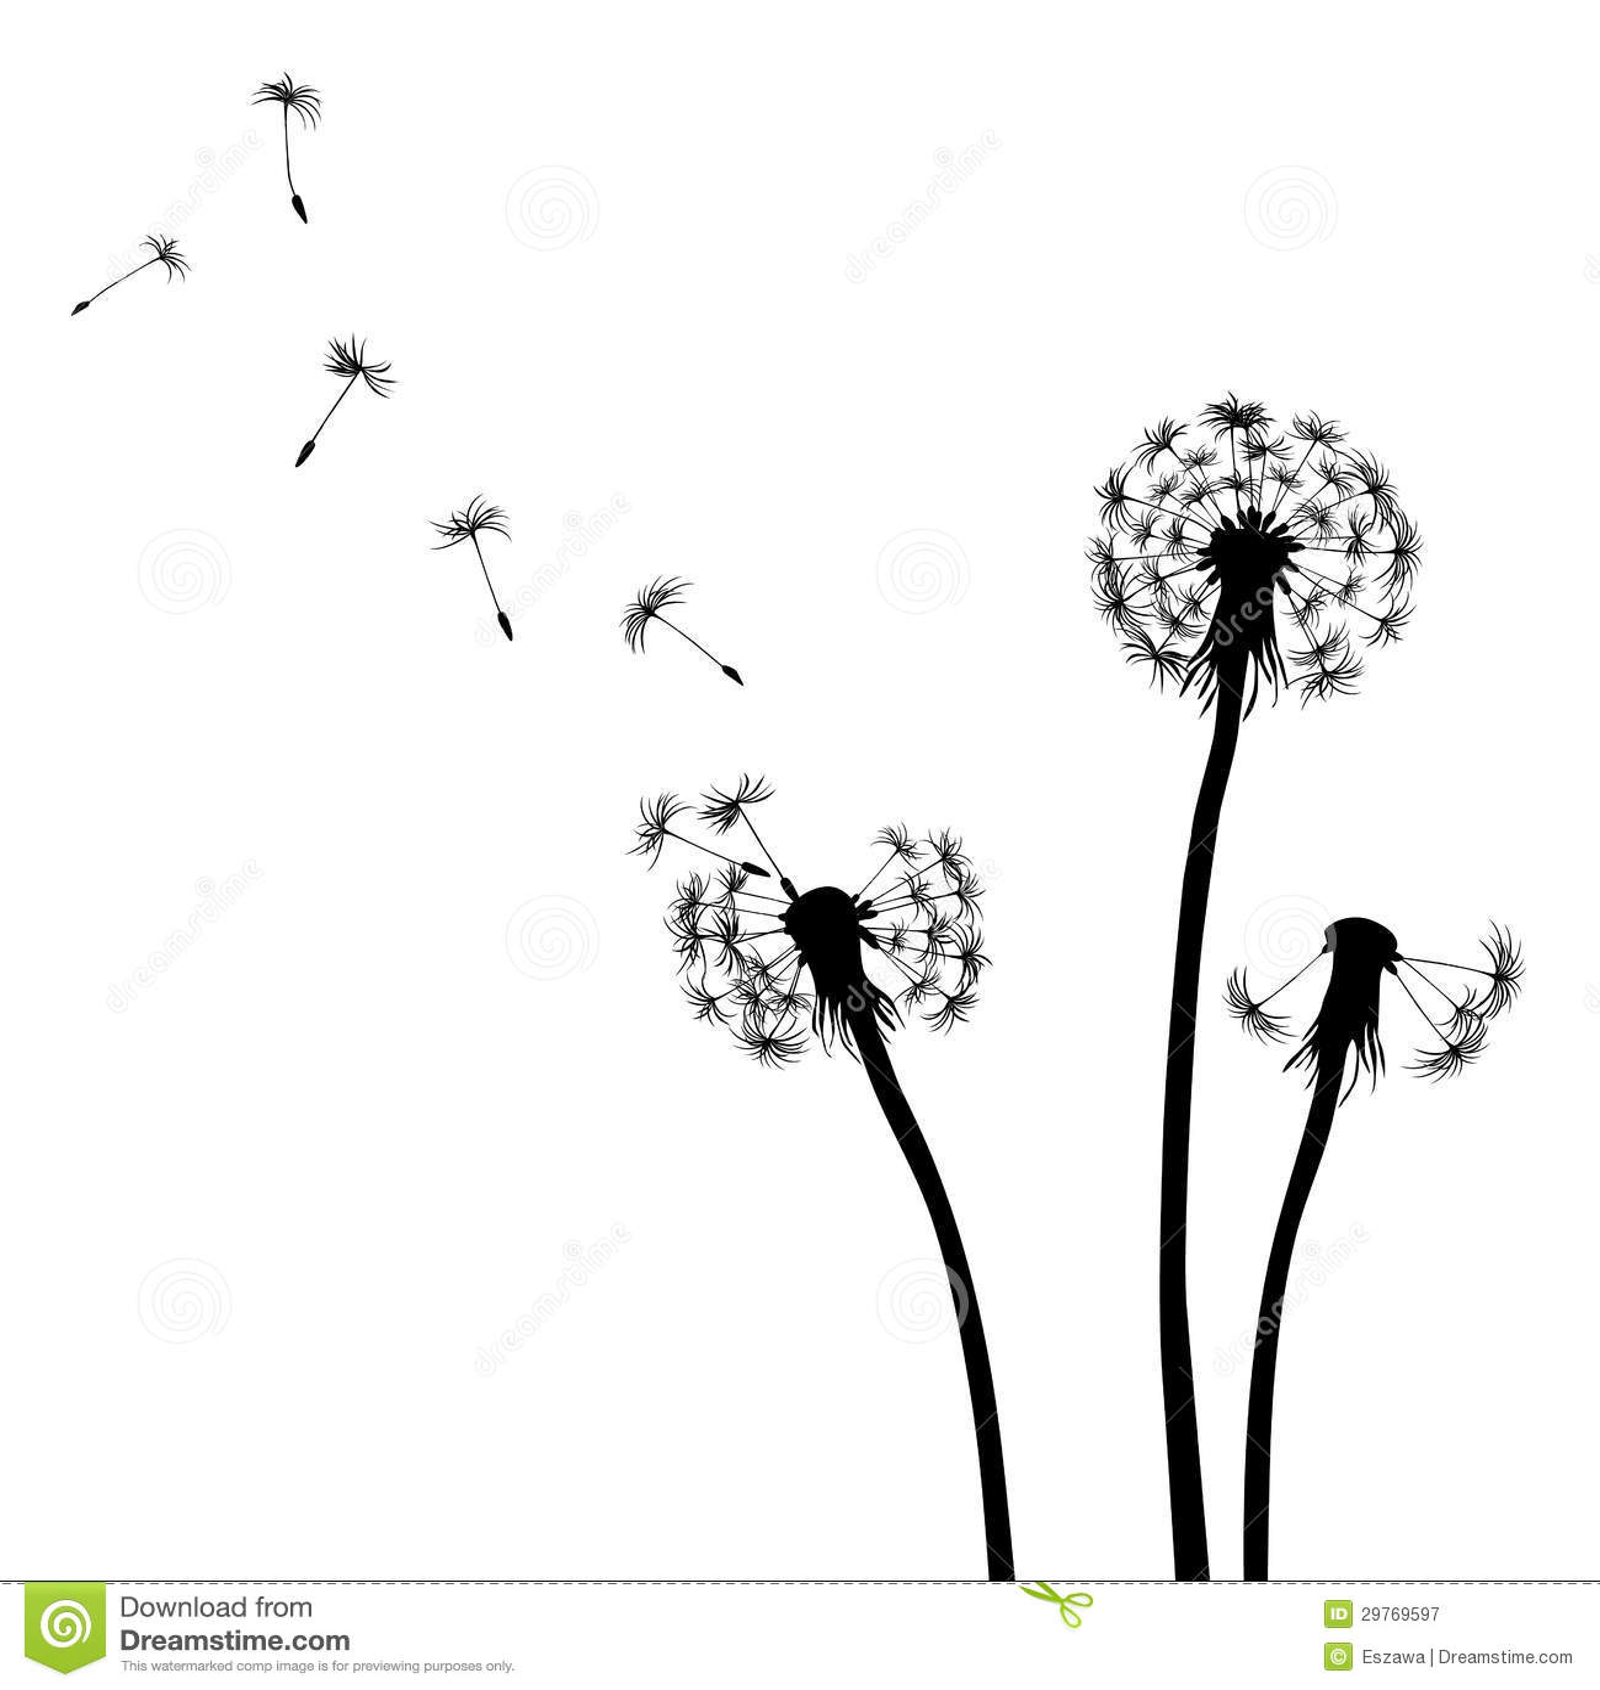 Dandelion Clip Art Free Floral background, dandelion